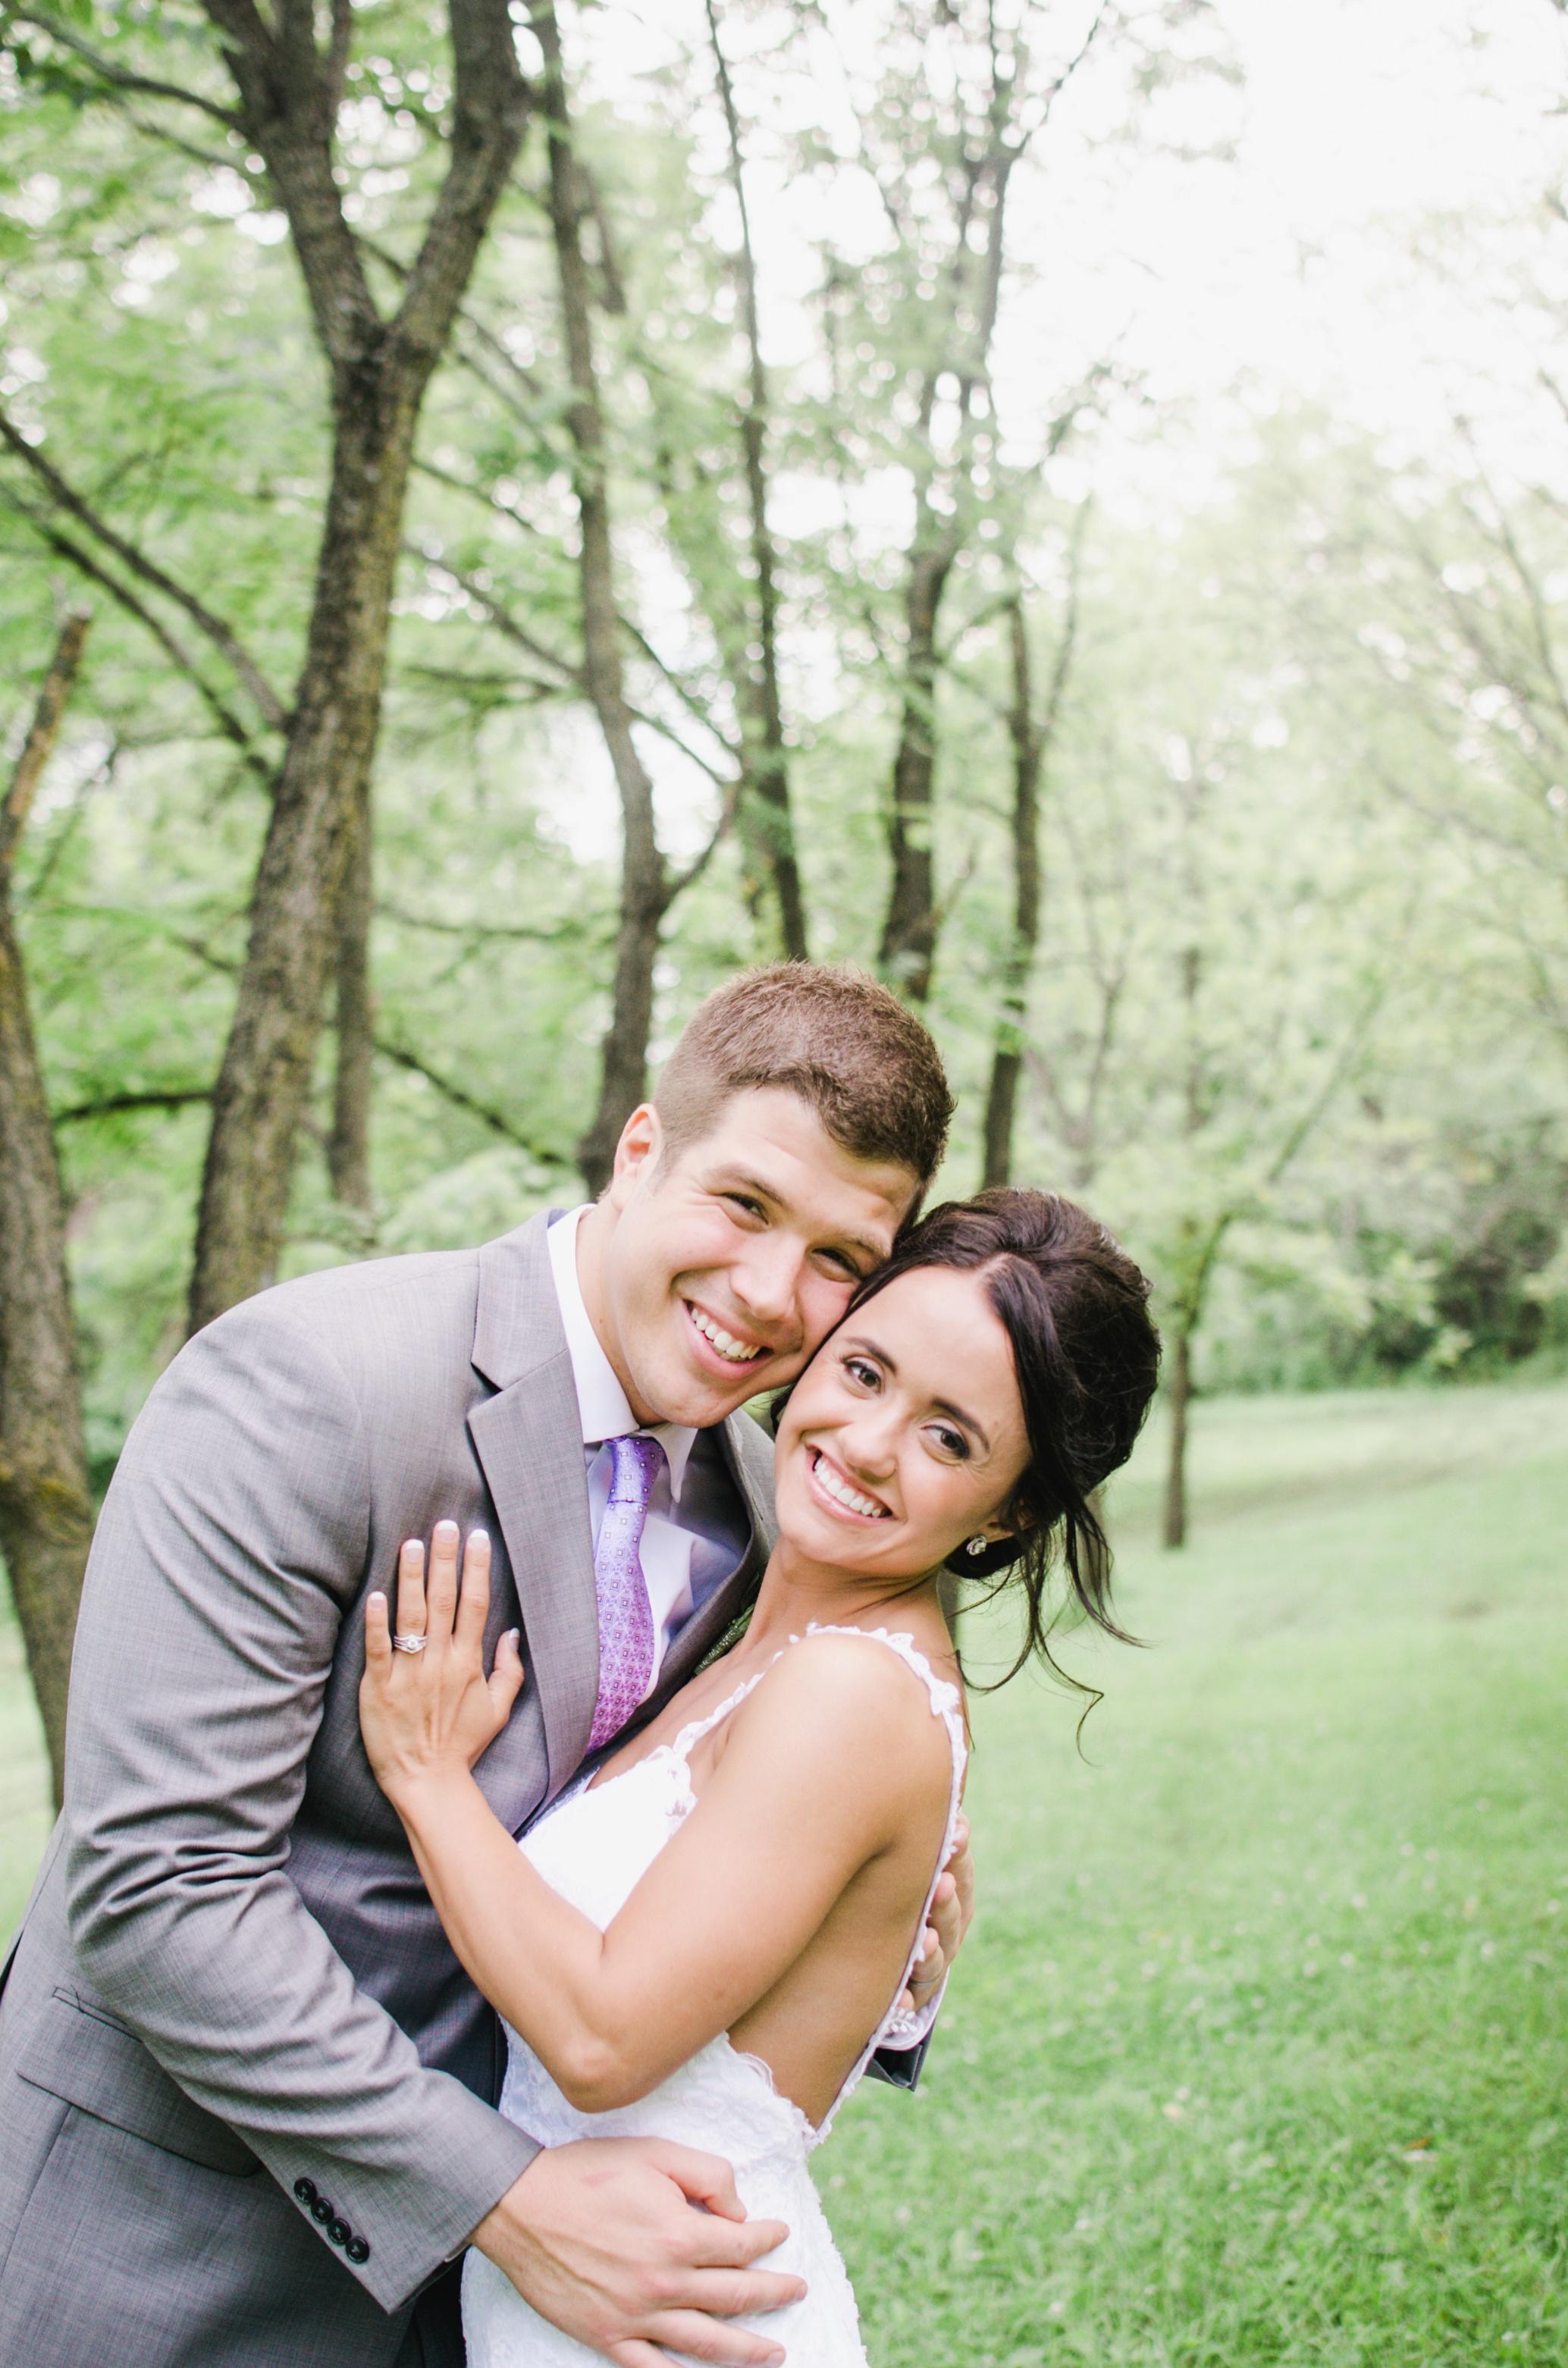 Barnes' Place Rustic Outdoor Wedding | Ali Leigh Photo Minneapolis Wedding Photographer_0154.jpg